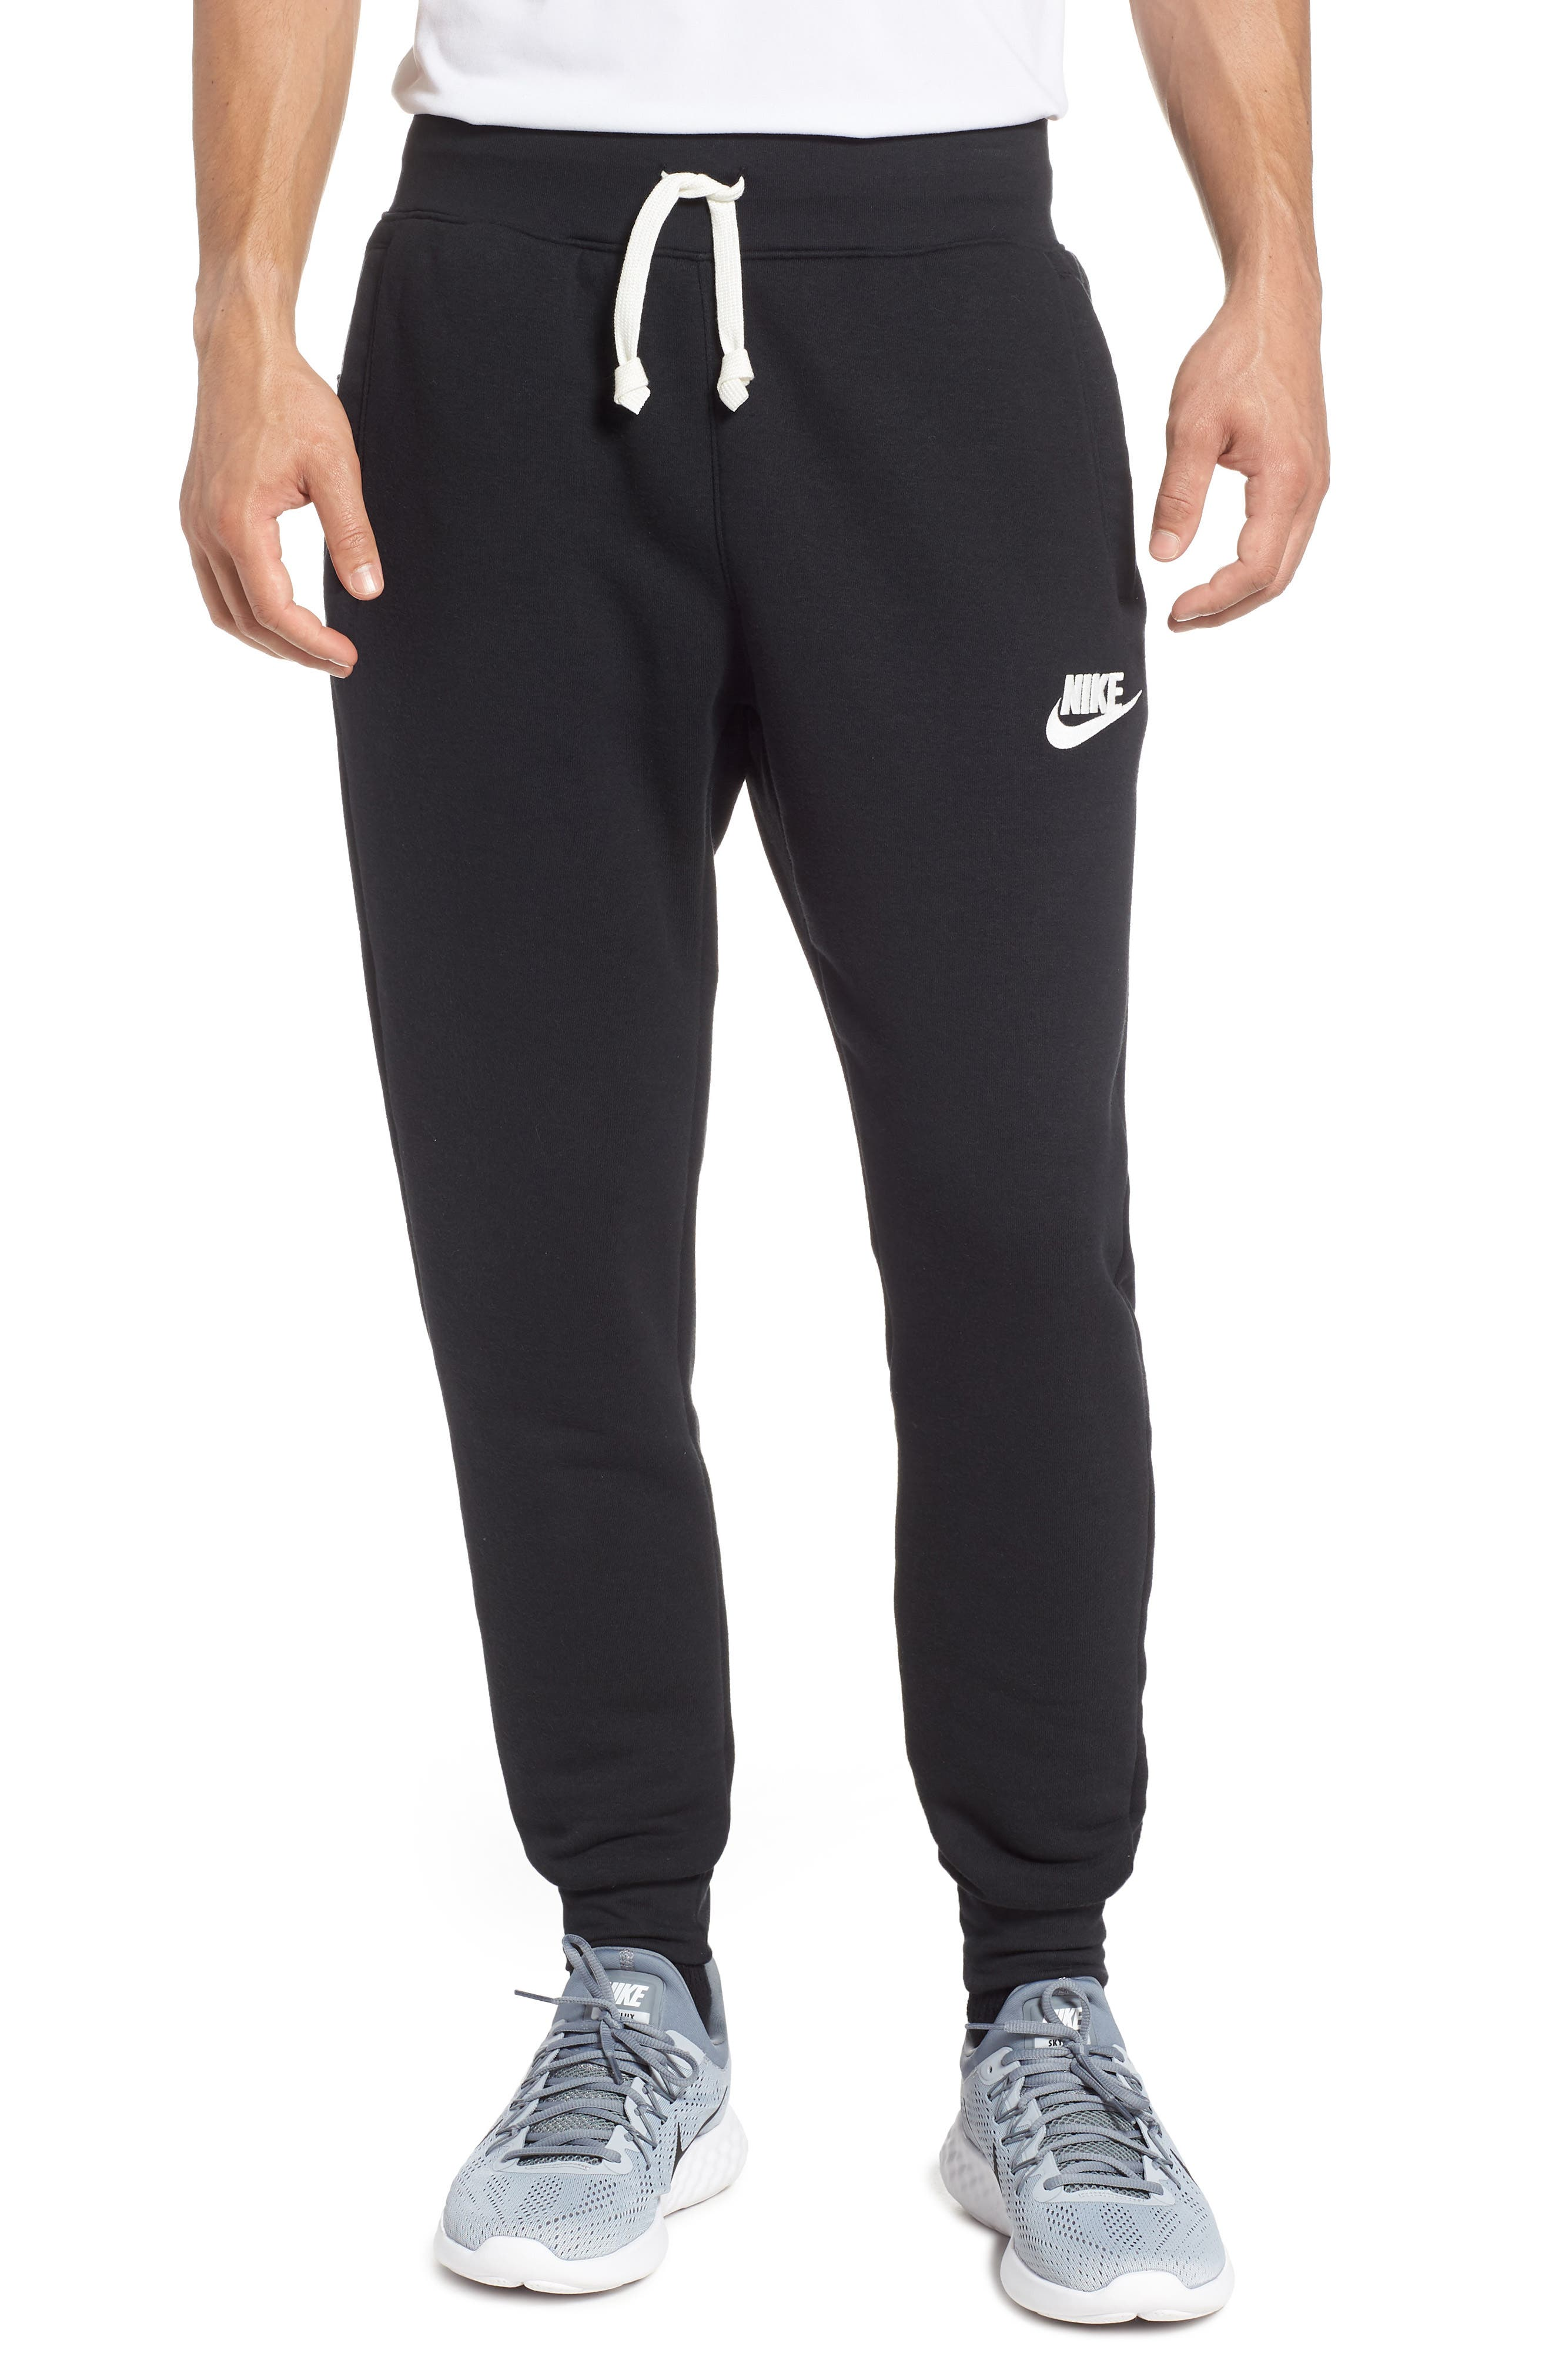 Heritage Jogger Pants,                         Main,                         color, BLACK/ SAIL